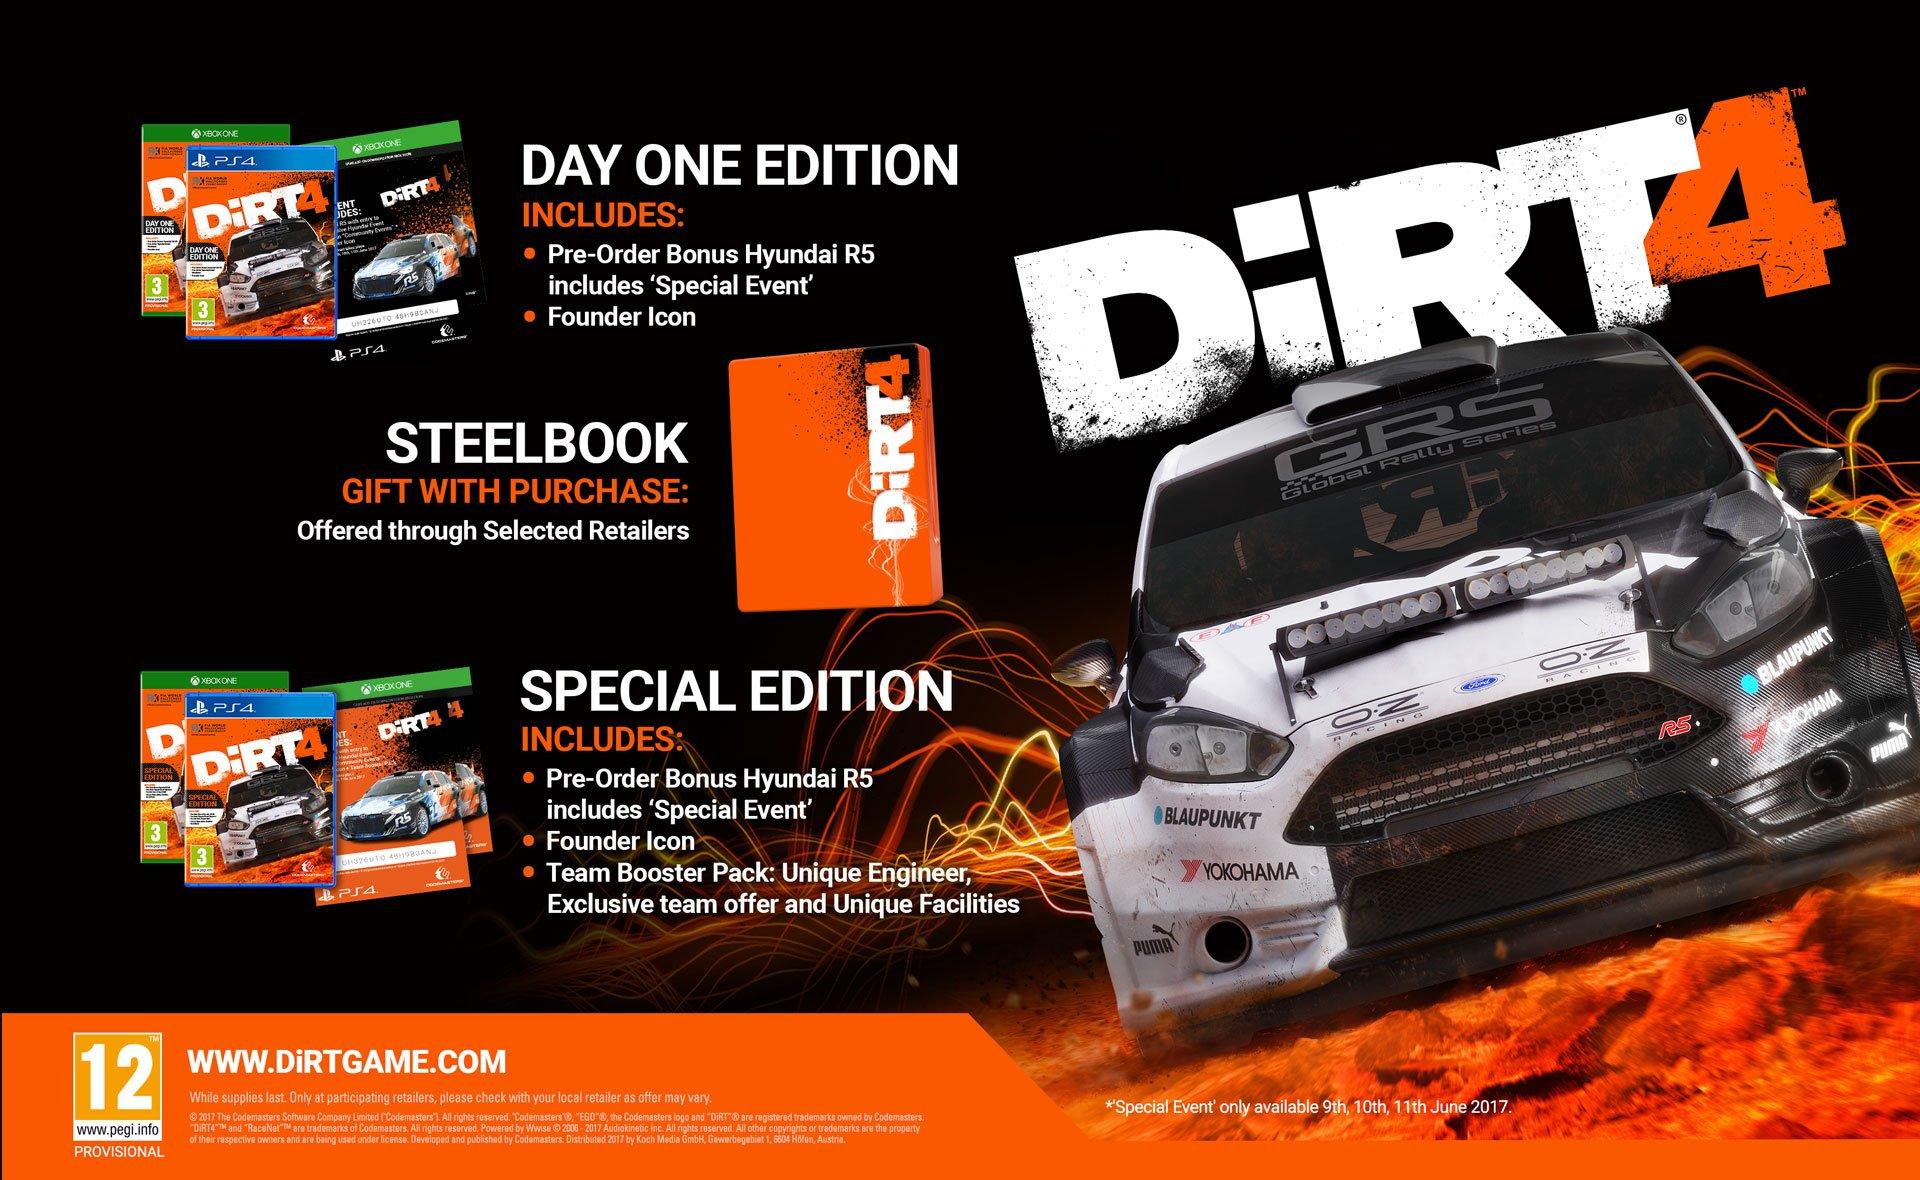 DiRT 4 editions